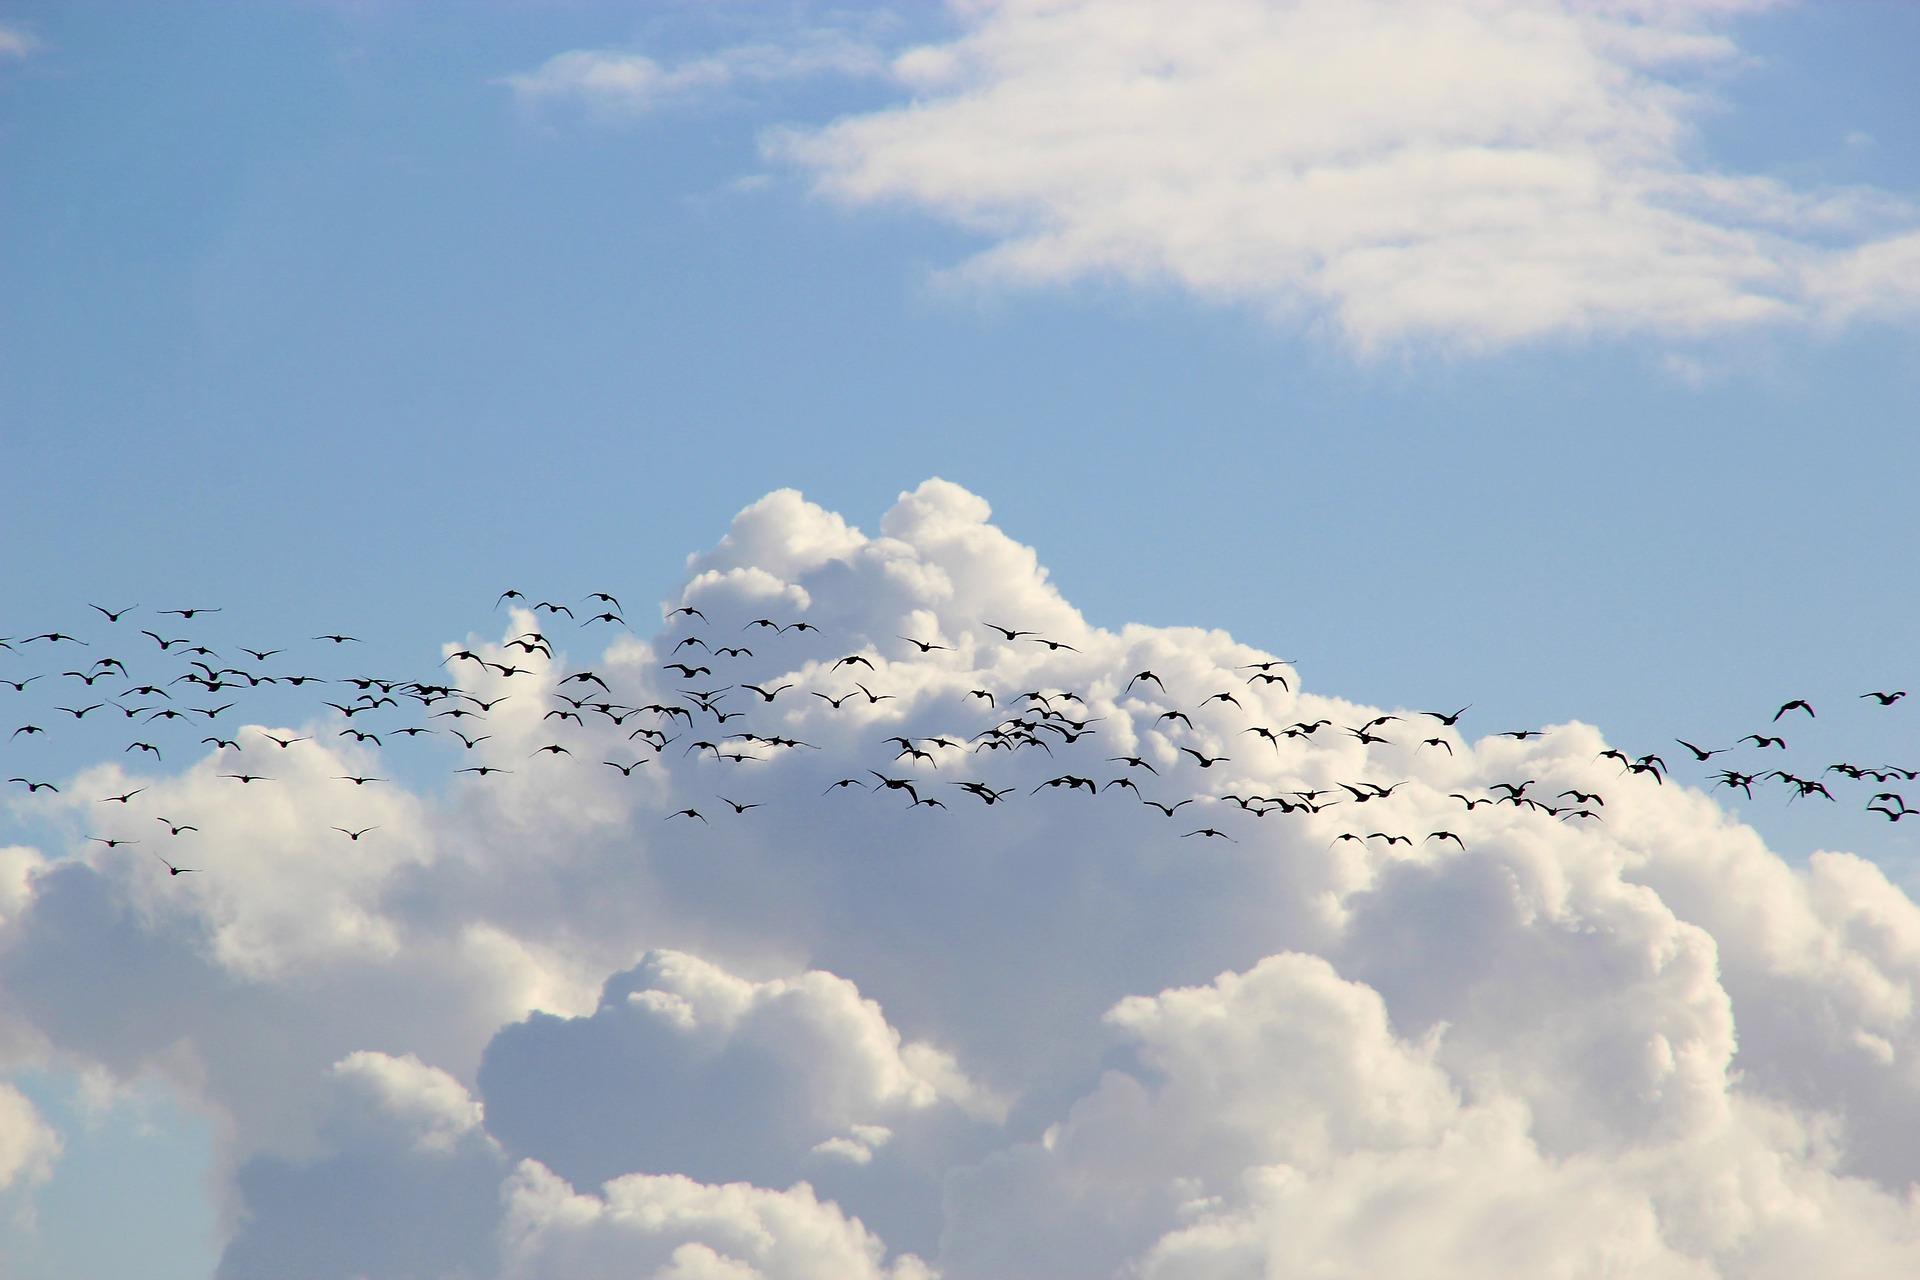 a flock of birds flying through a cloudy blue sky